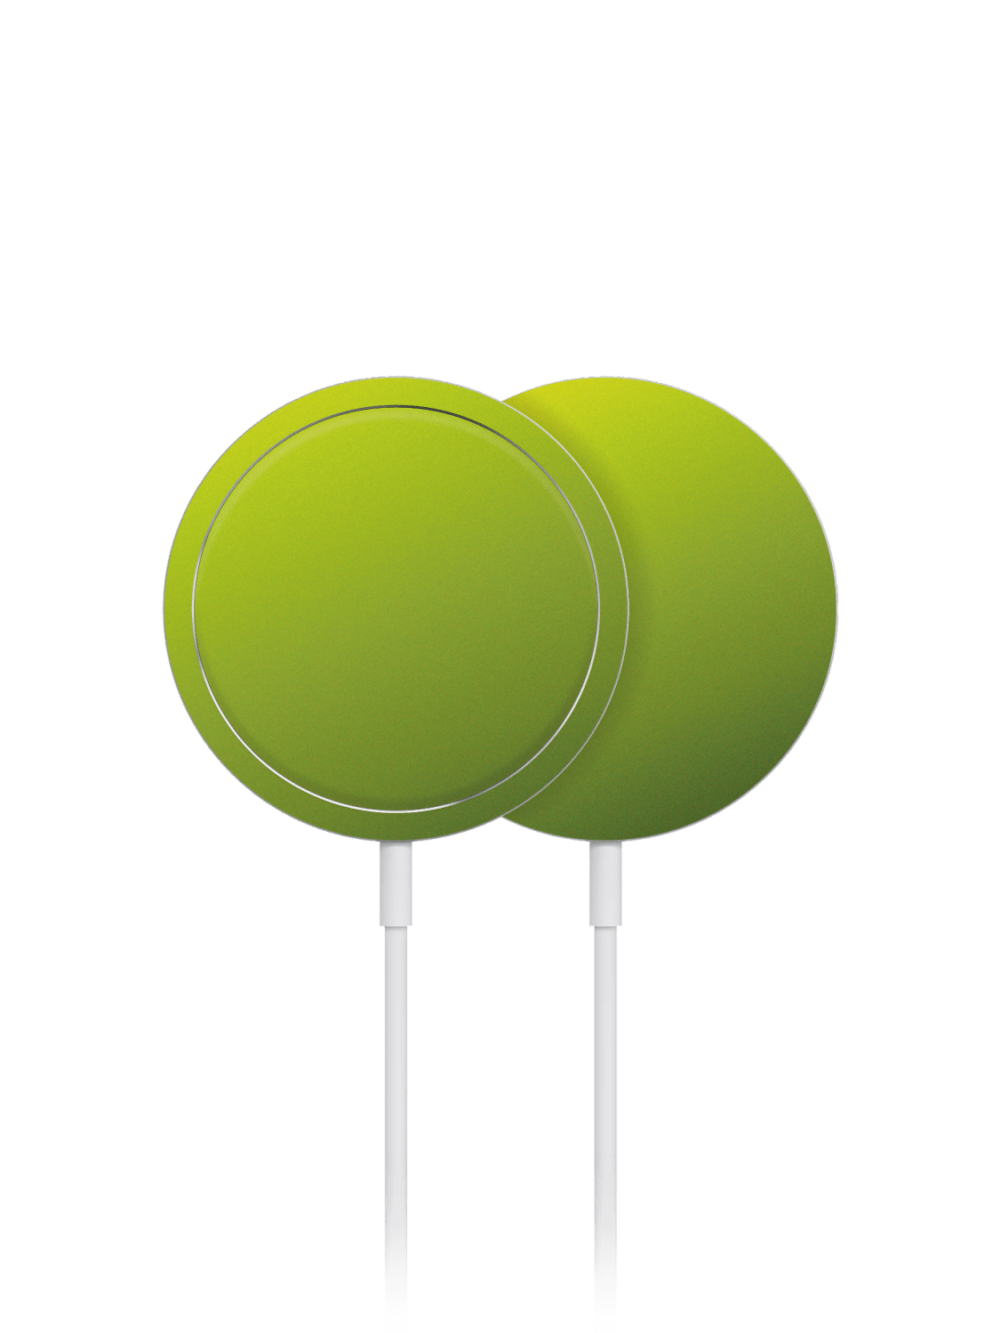 Matt viper green metallic skin wrap for Apple MagSafe Charger